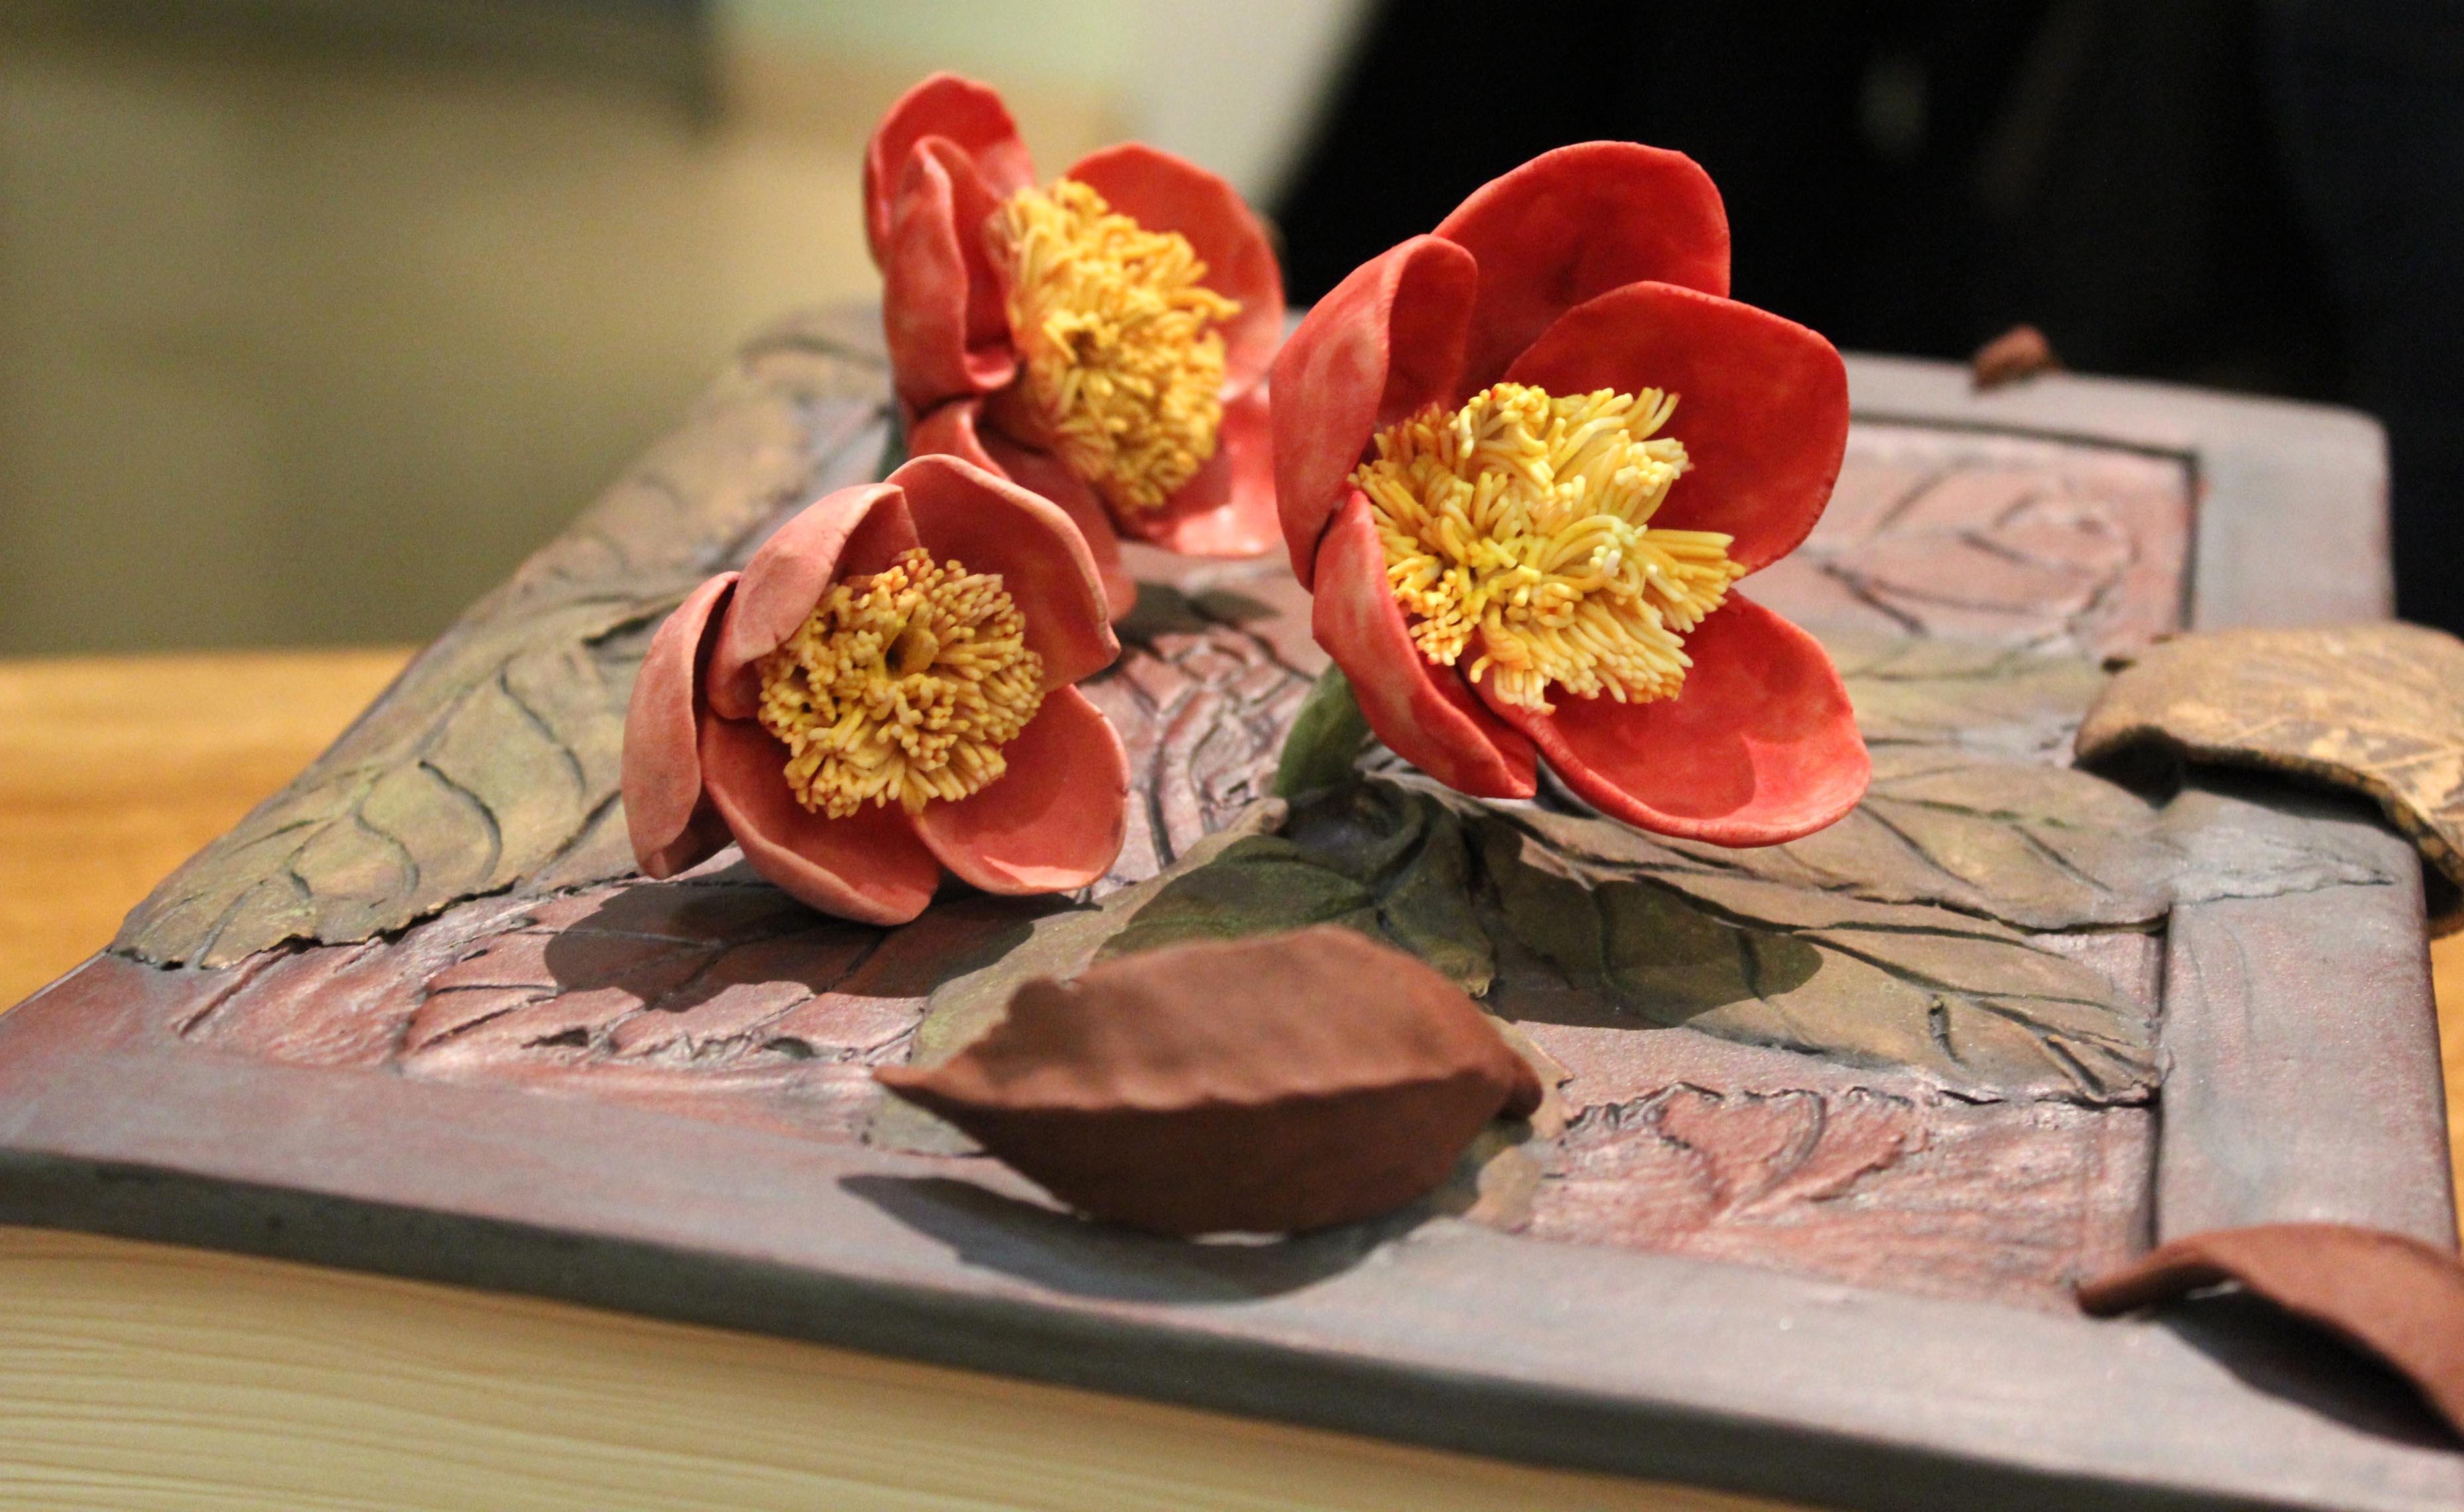 Book of Camellias, detail